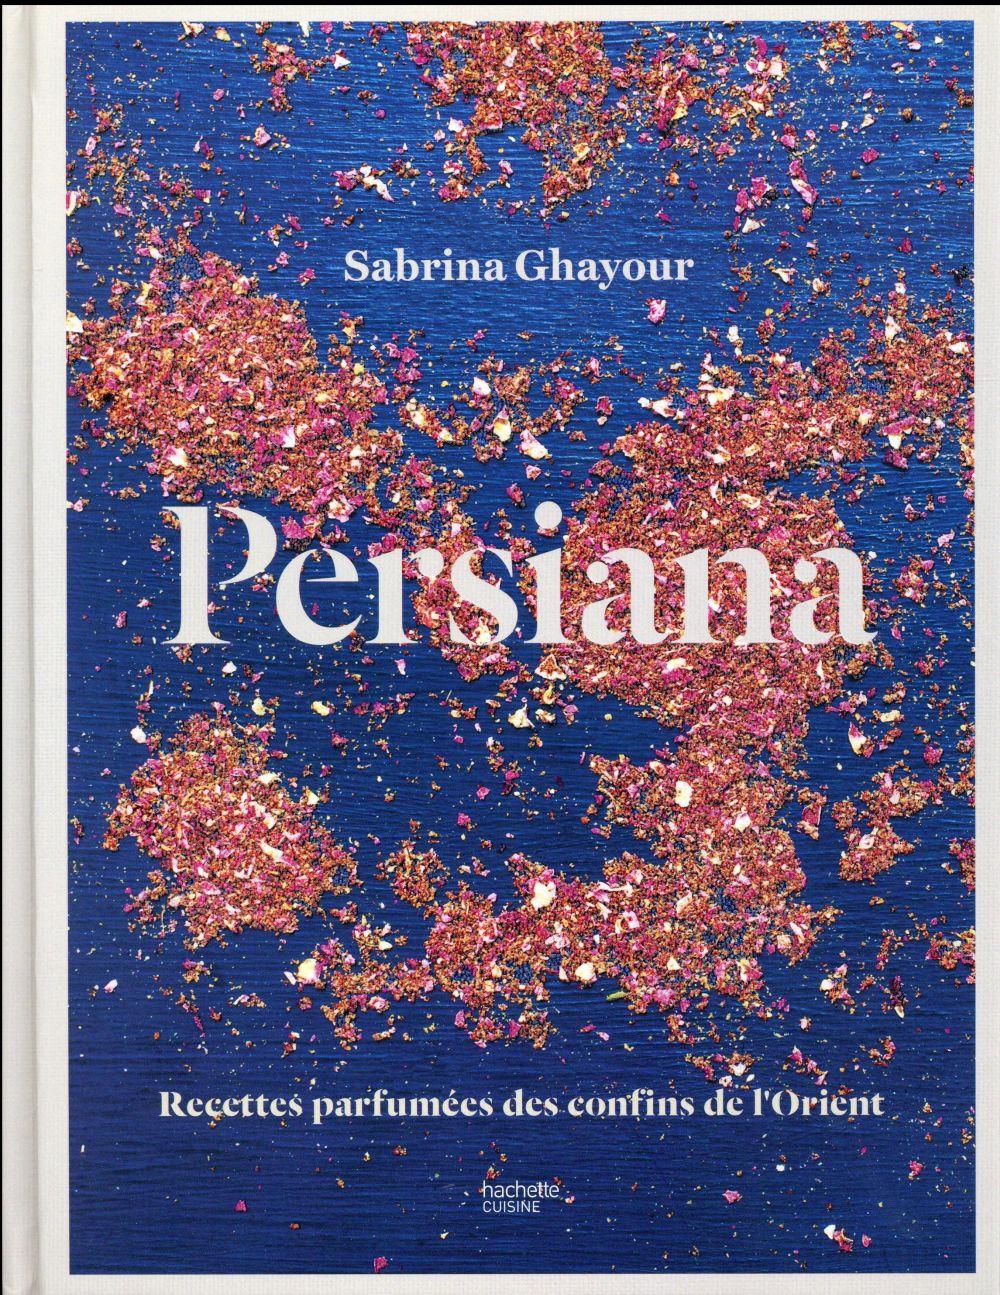 PERSIANA - RECETTES PARFUMEES DES CONFINS DE L'ORIENT